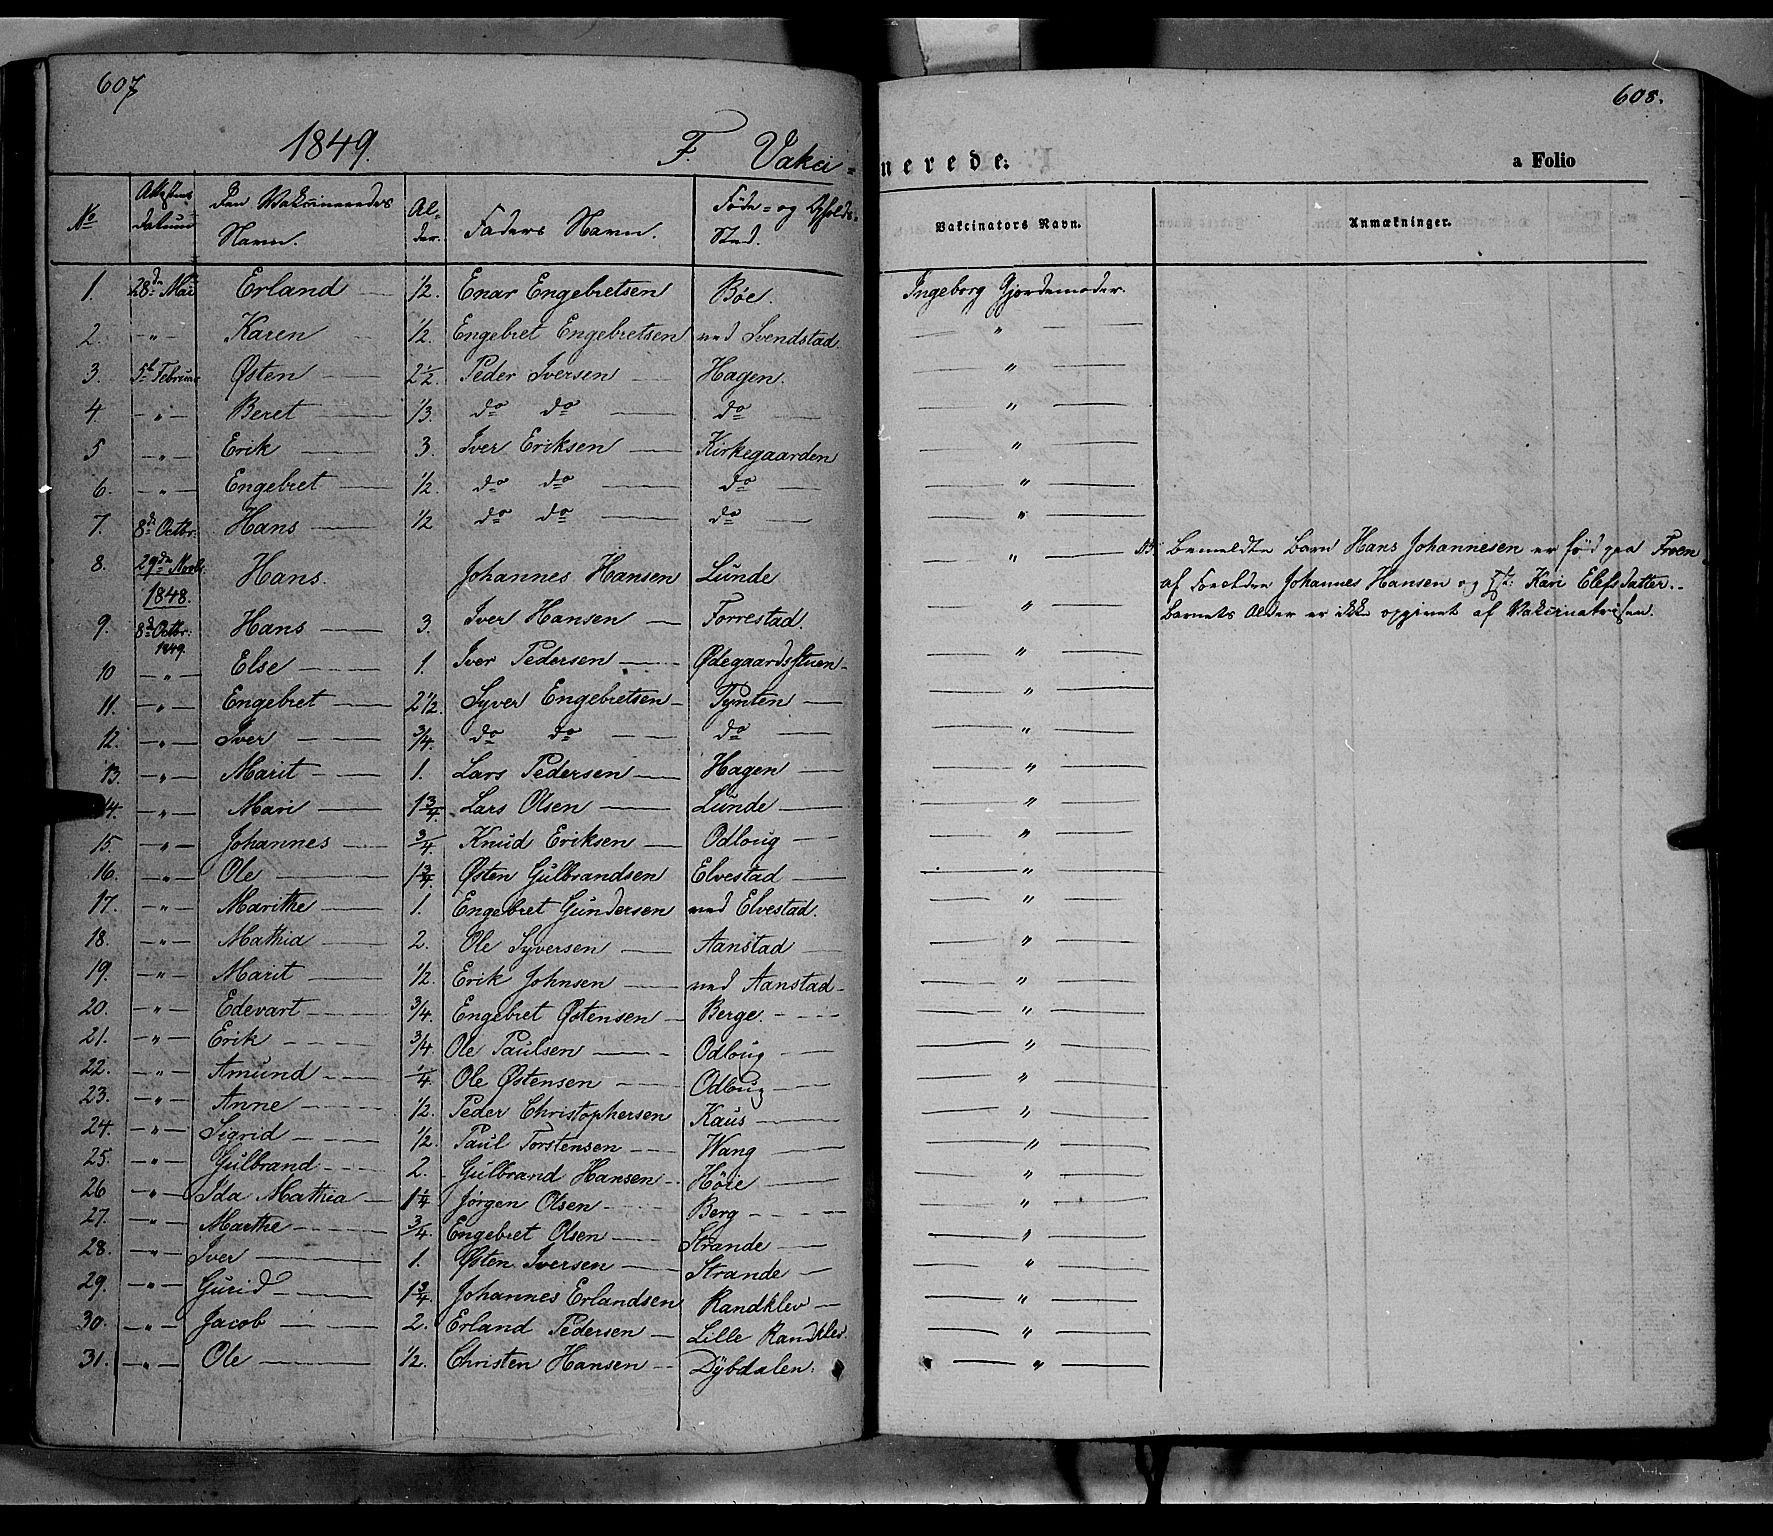 SAH, Ringebu prestekontor, Ministerialbok nr. 6, 1848-1859, s. 607-608